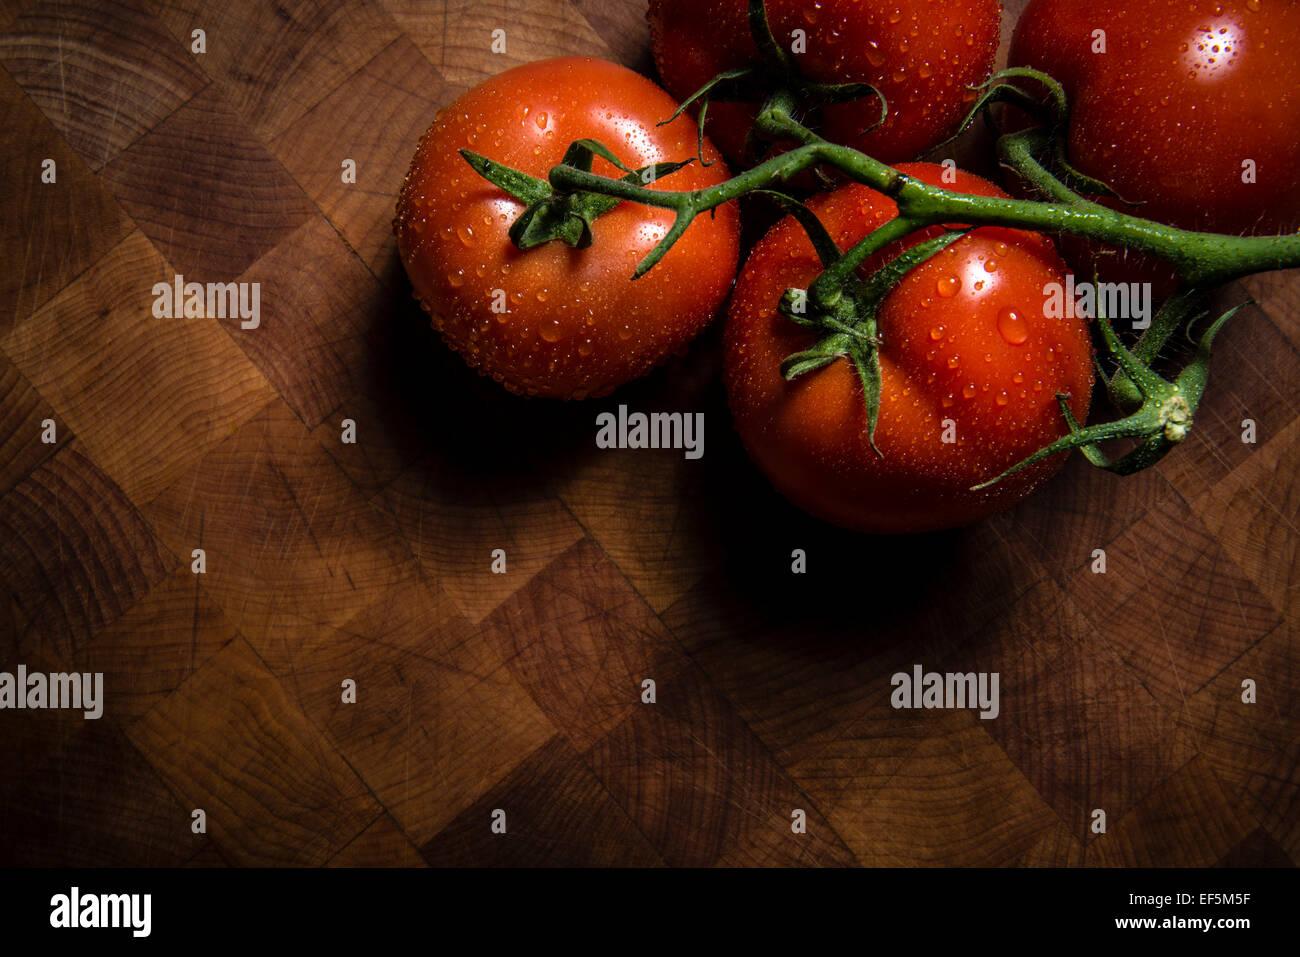 Tomaten auf einem Schneidebrett nass Stockbild